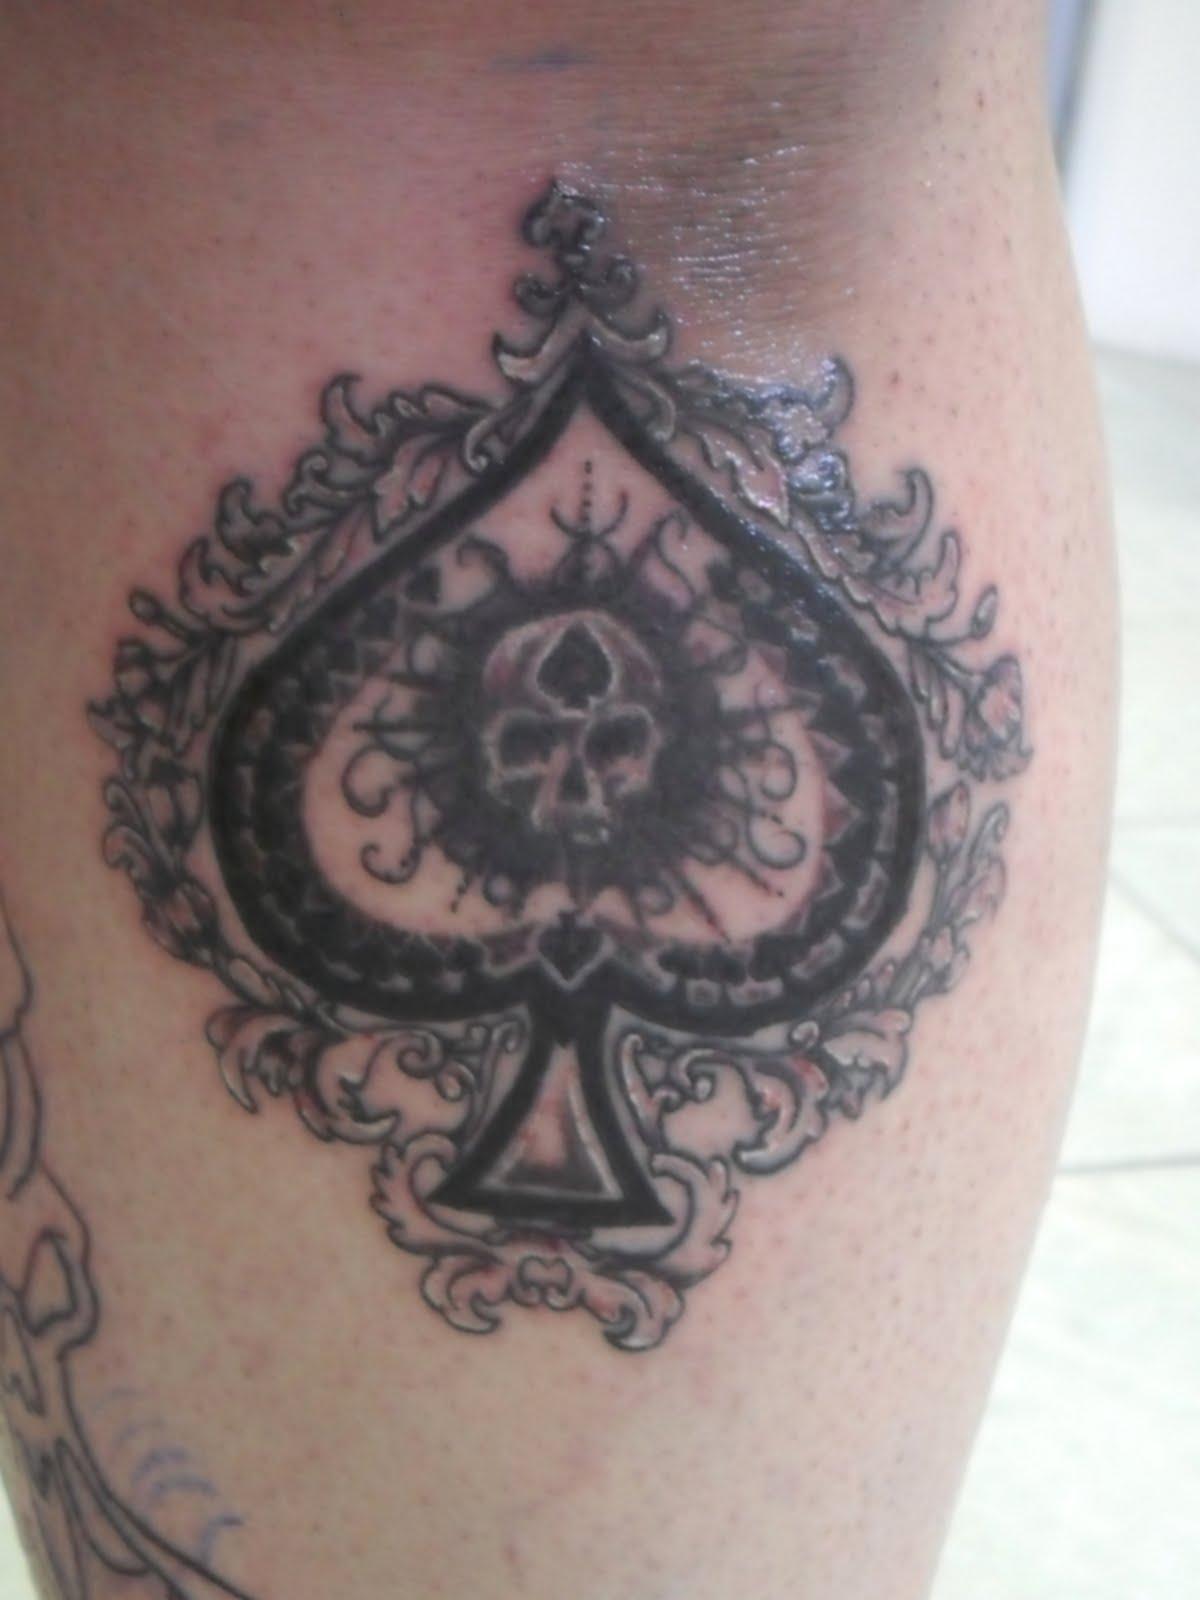 Espada Tattoo As De PictureEspada Tattoo